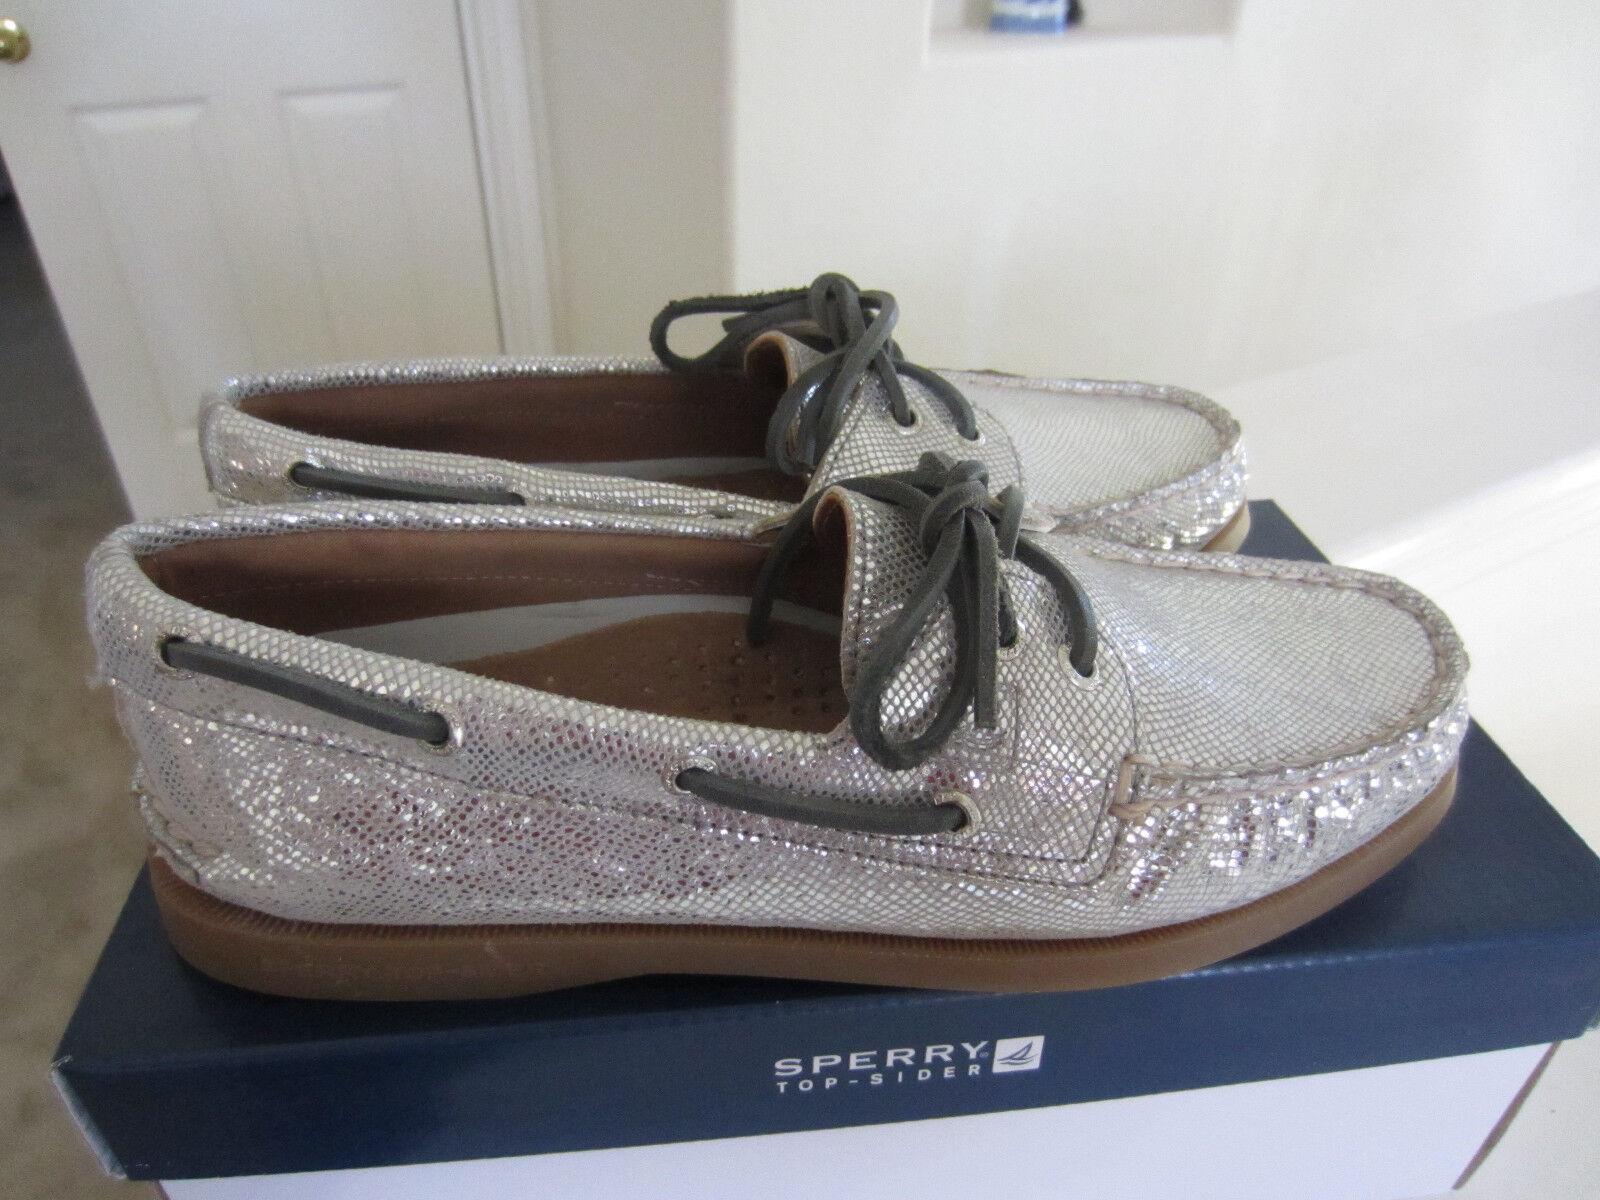 sperry haut sider femmes a / taille o 2-eye taille / de chaussures python serpent pour métalliques 7,5  95 30b397